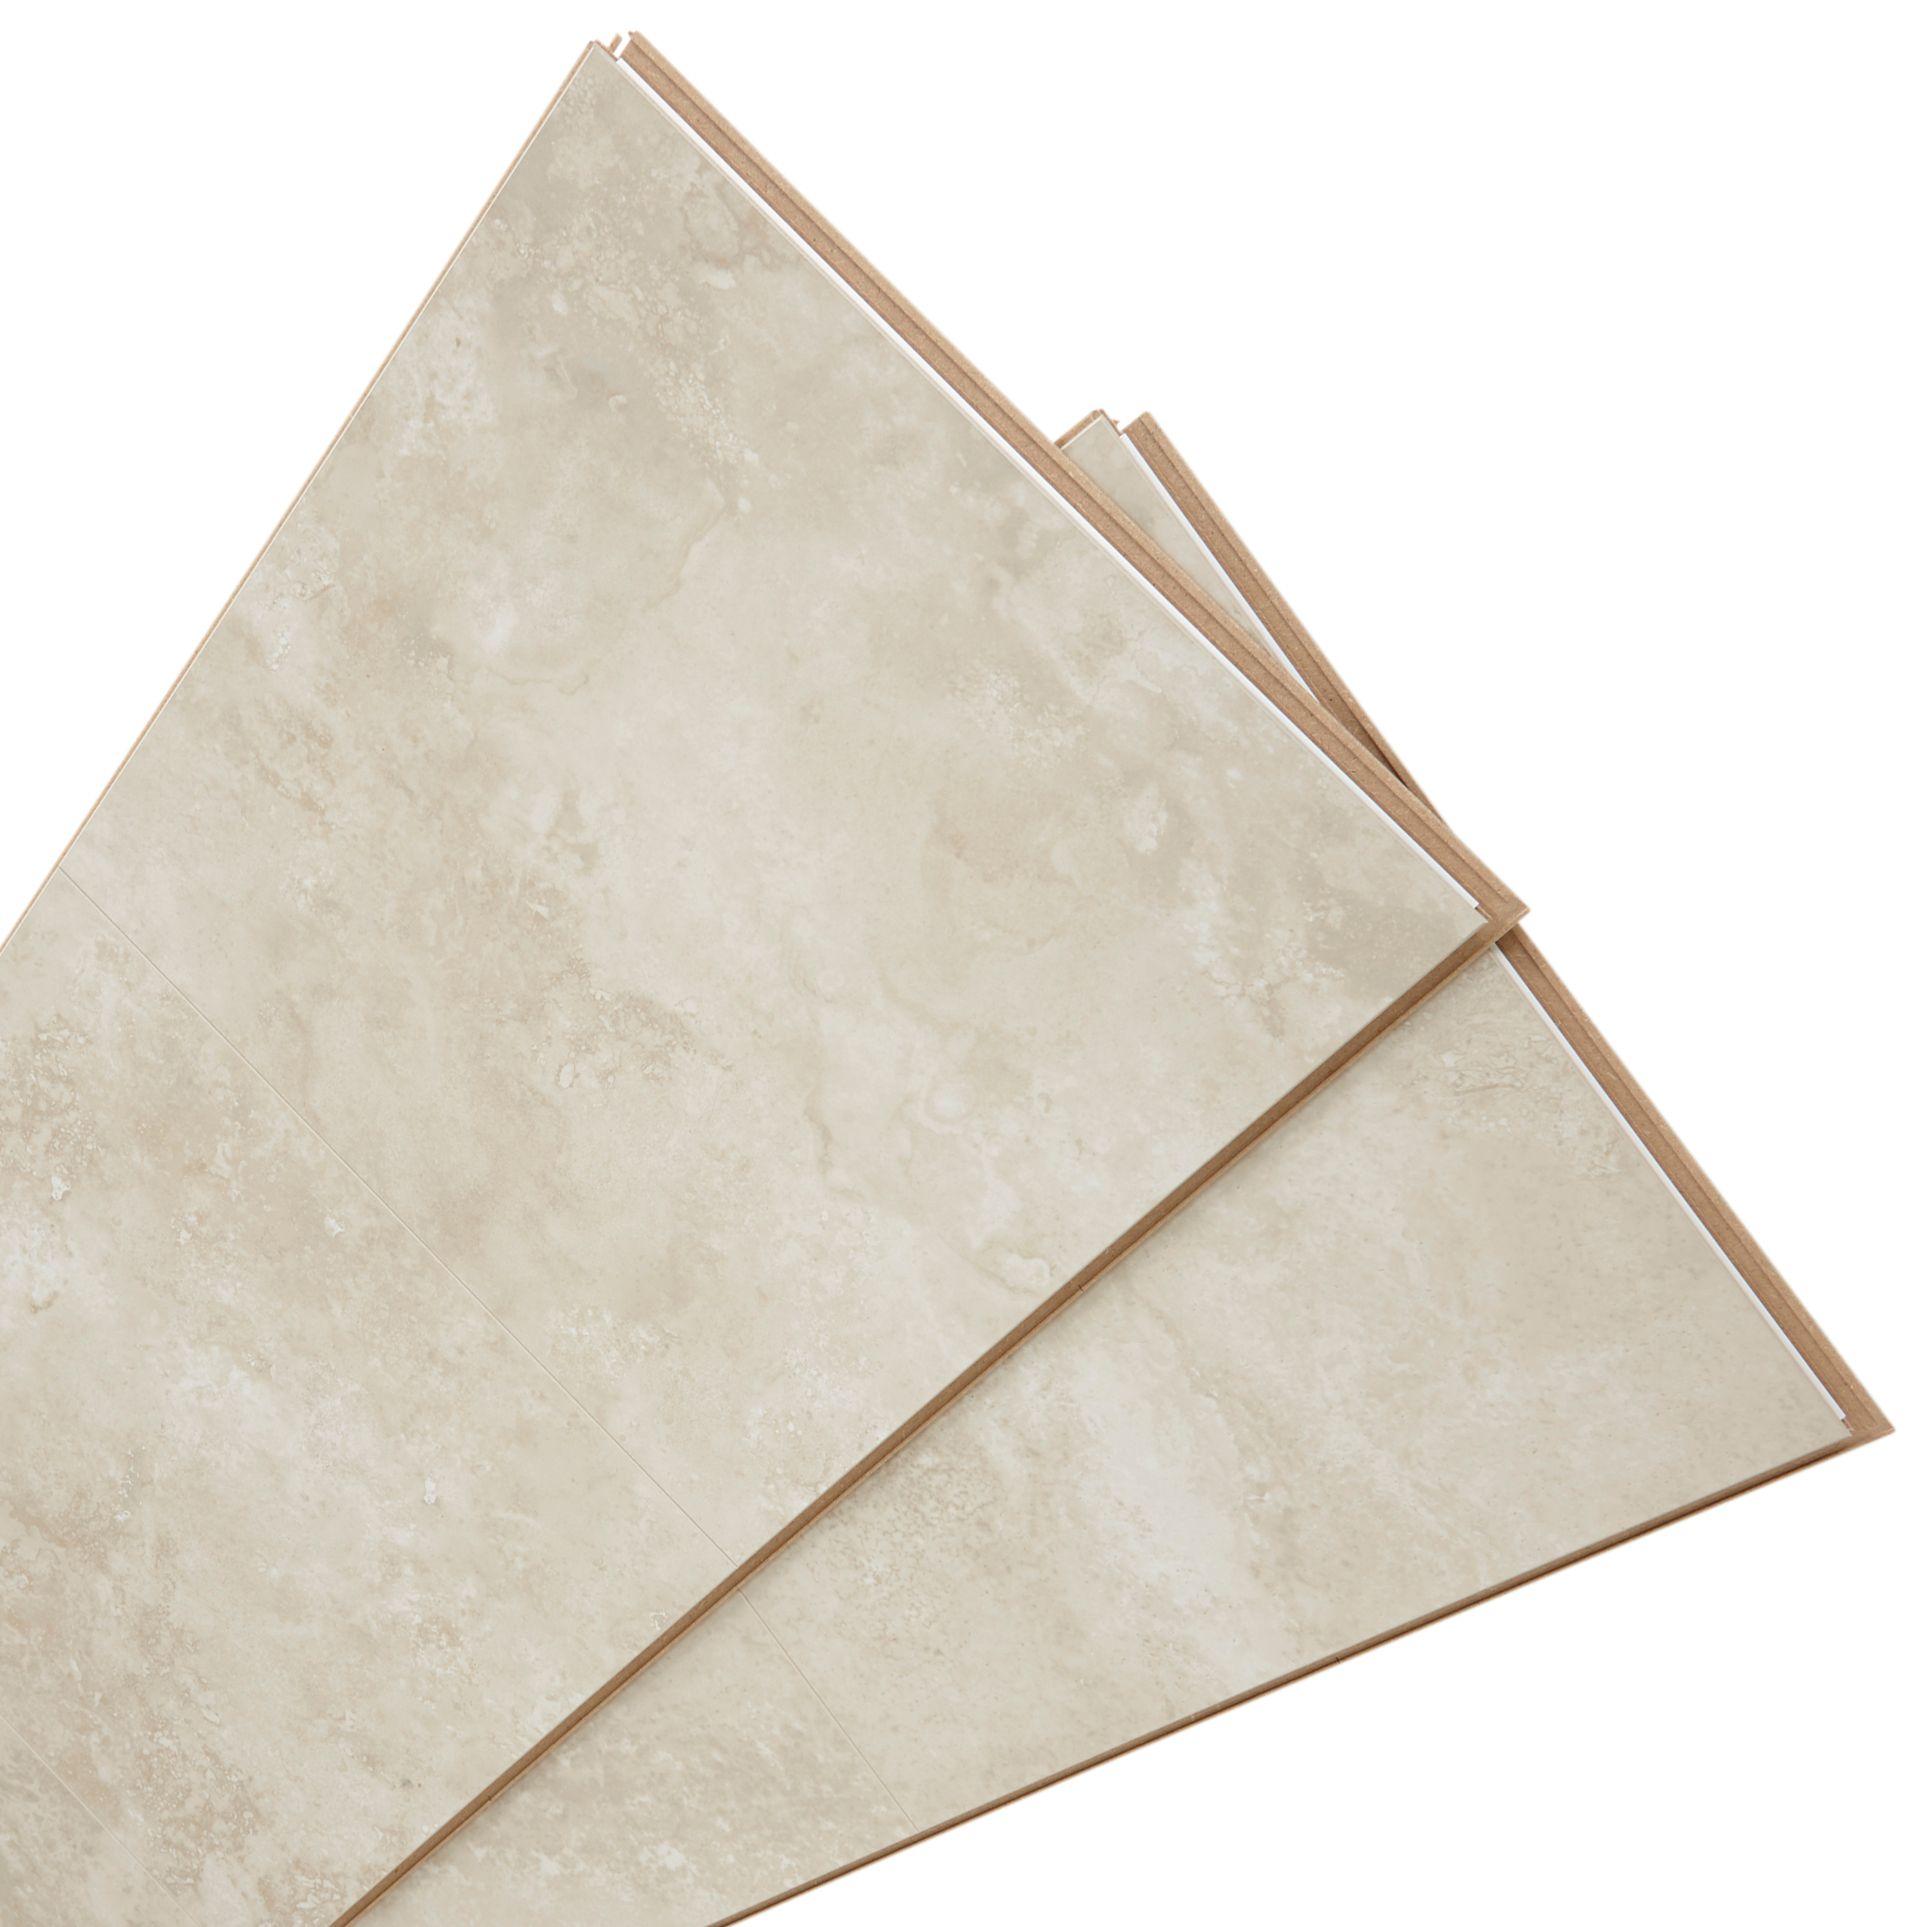 Tila Cream Travertine Tile Effect Laminate Flooring